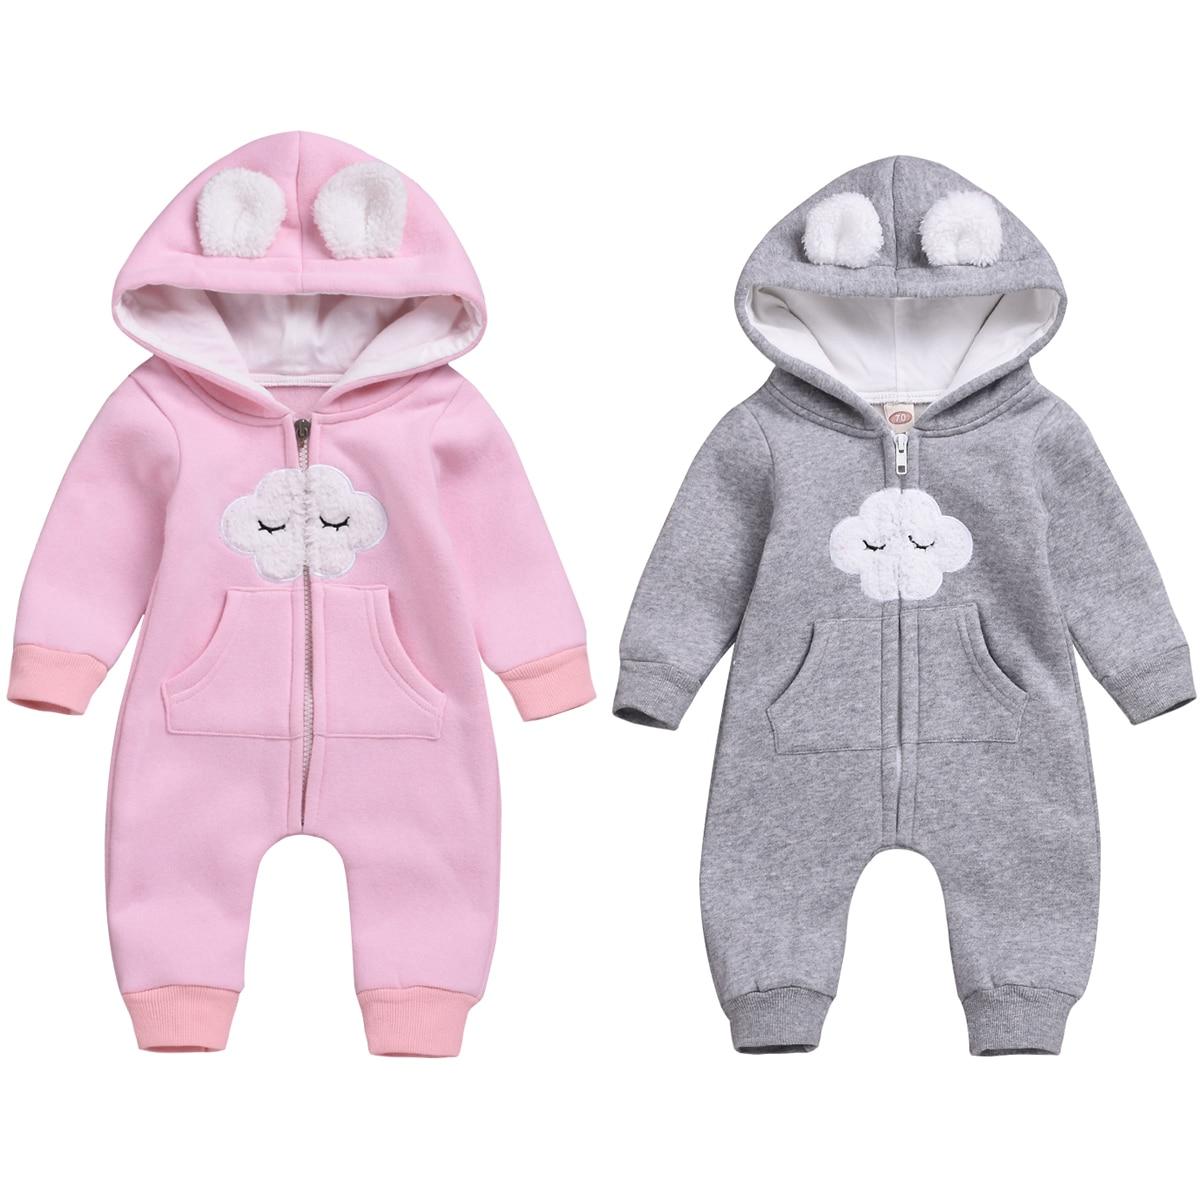 Winter Autumn Baby Rompers Cute Ear Hooded Jumpsuit Warm Girl Overalls Newborn Boy